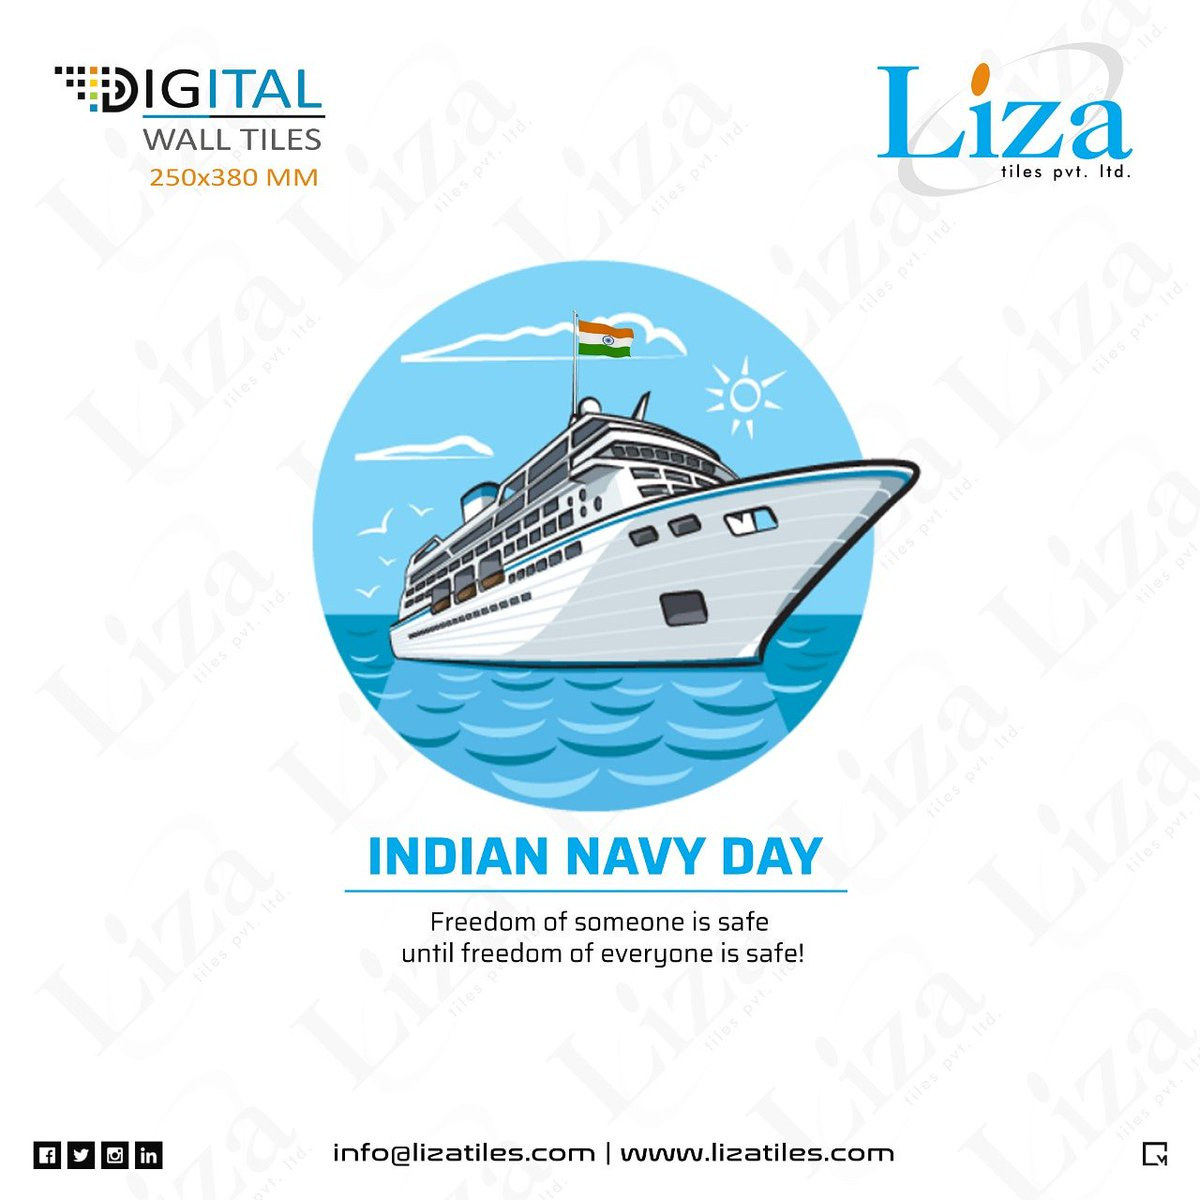 Liza Tiles Pvt Ltd On Twitter Indian Navy Day Digital